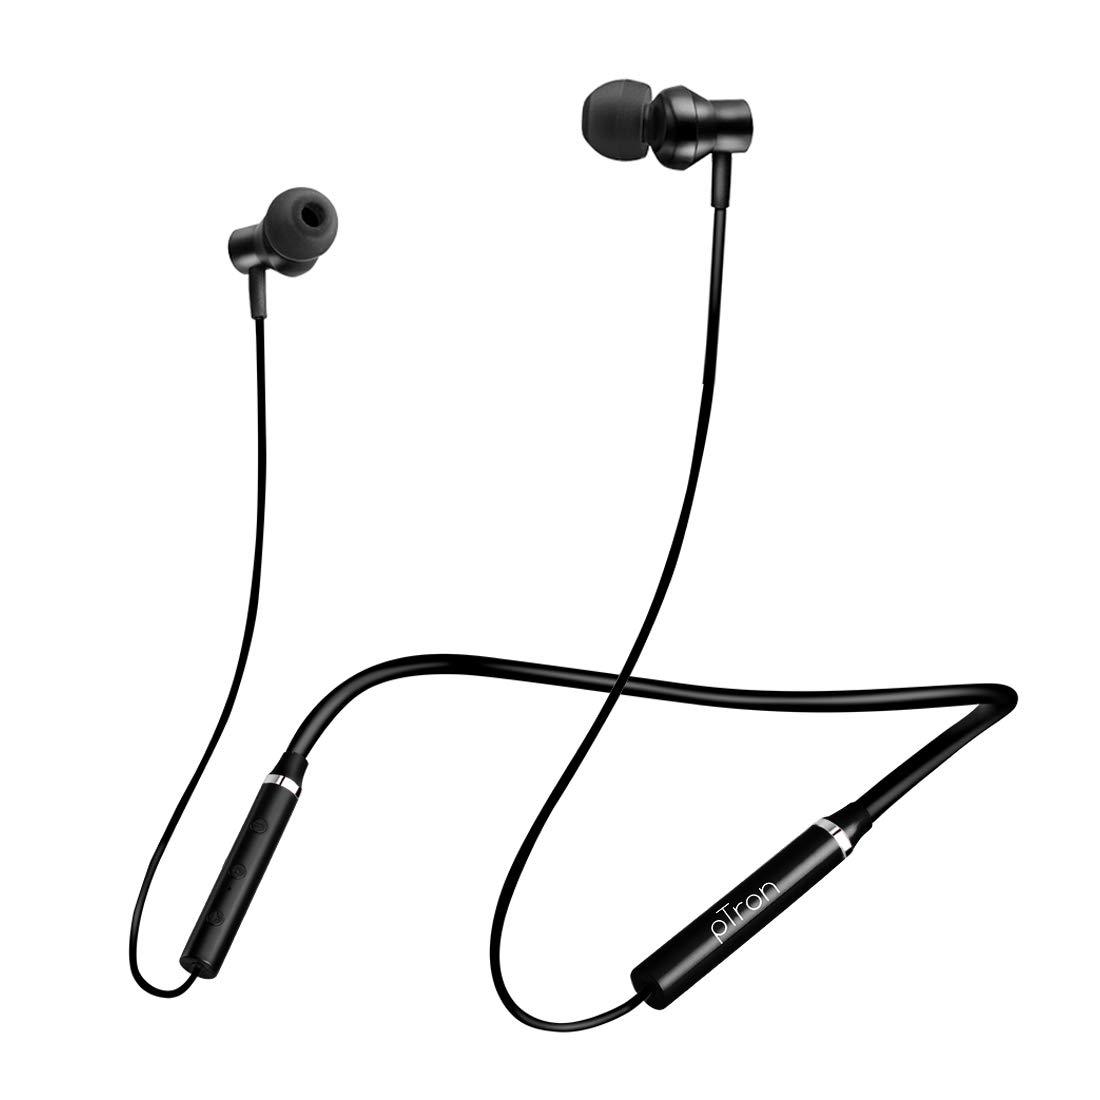 pTron Tangent Beats Bluetooth 5.0 Wireless Headphones with Deep Bass, Ergonomic Design, IPX4 Sweat/Waterproof Neckband, Magnetic Earbuds, Voice Assistant, Passive Noise Cancelation & Mic - (Black)